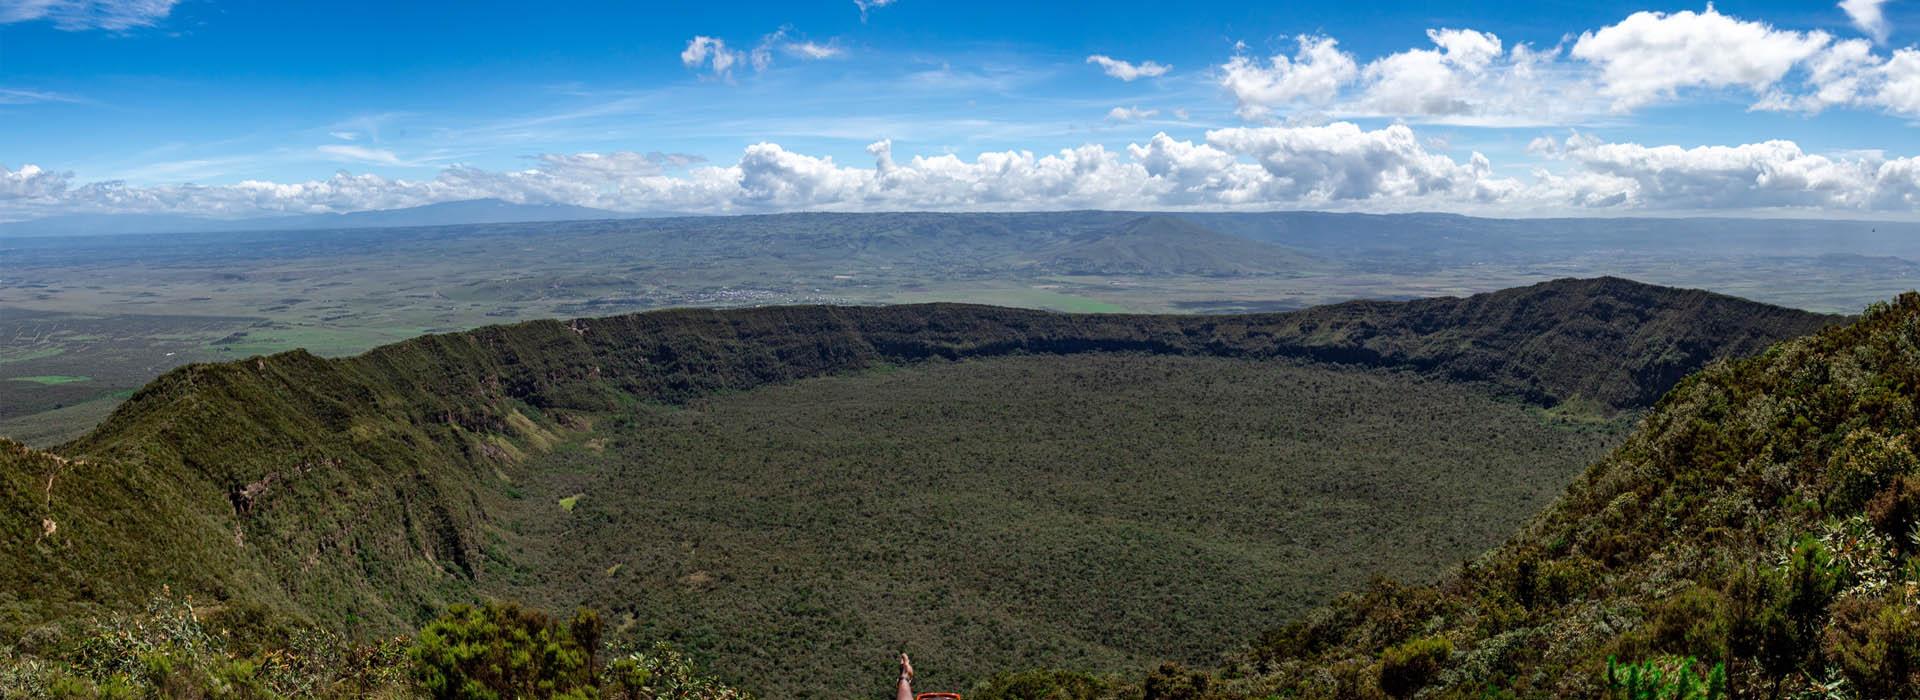 African Adventure Specialists - MOUNT LONGONOT NATIONAL PARK Destination